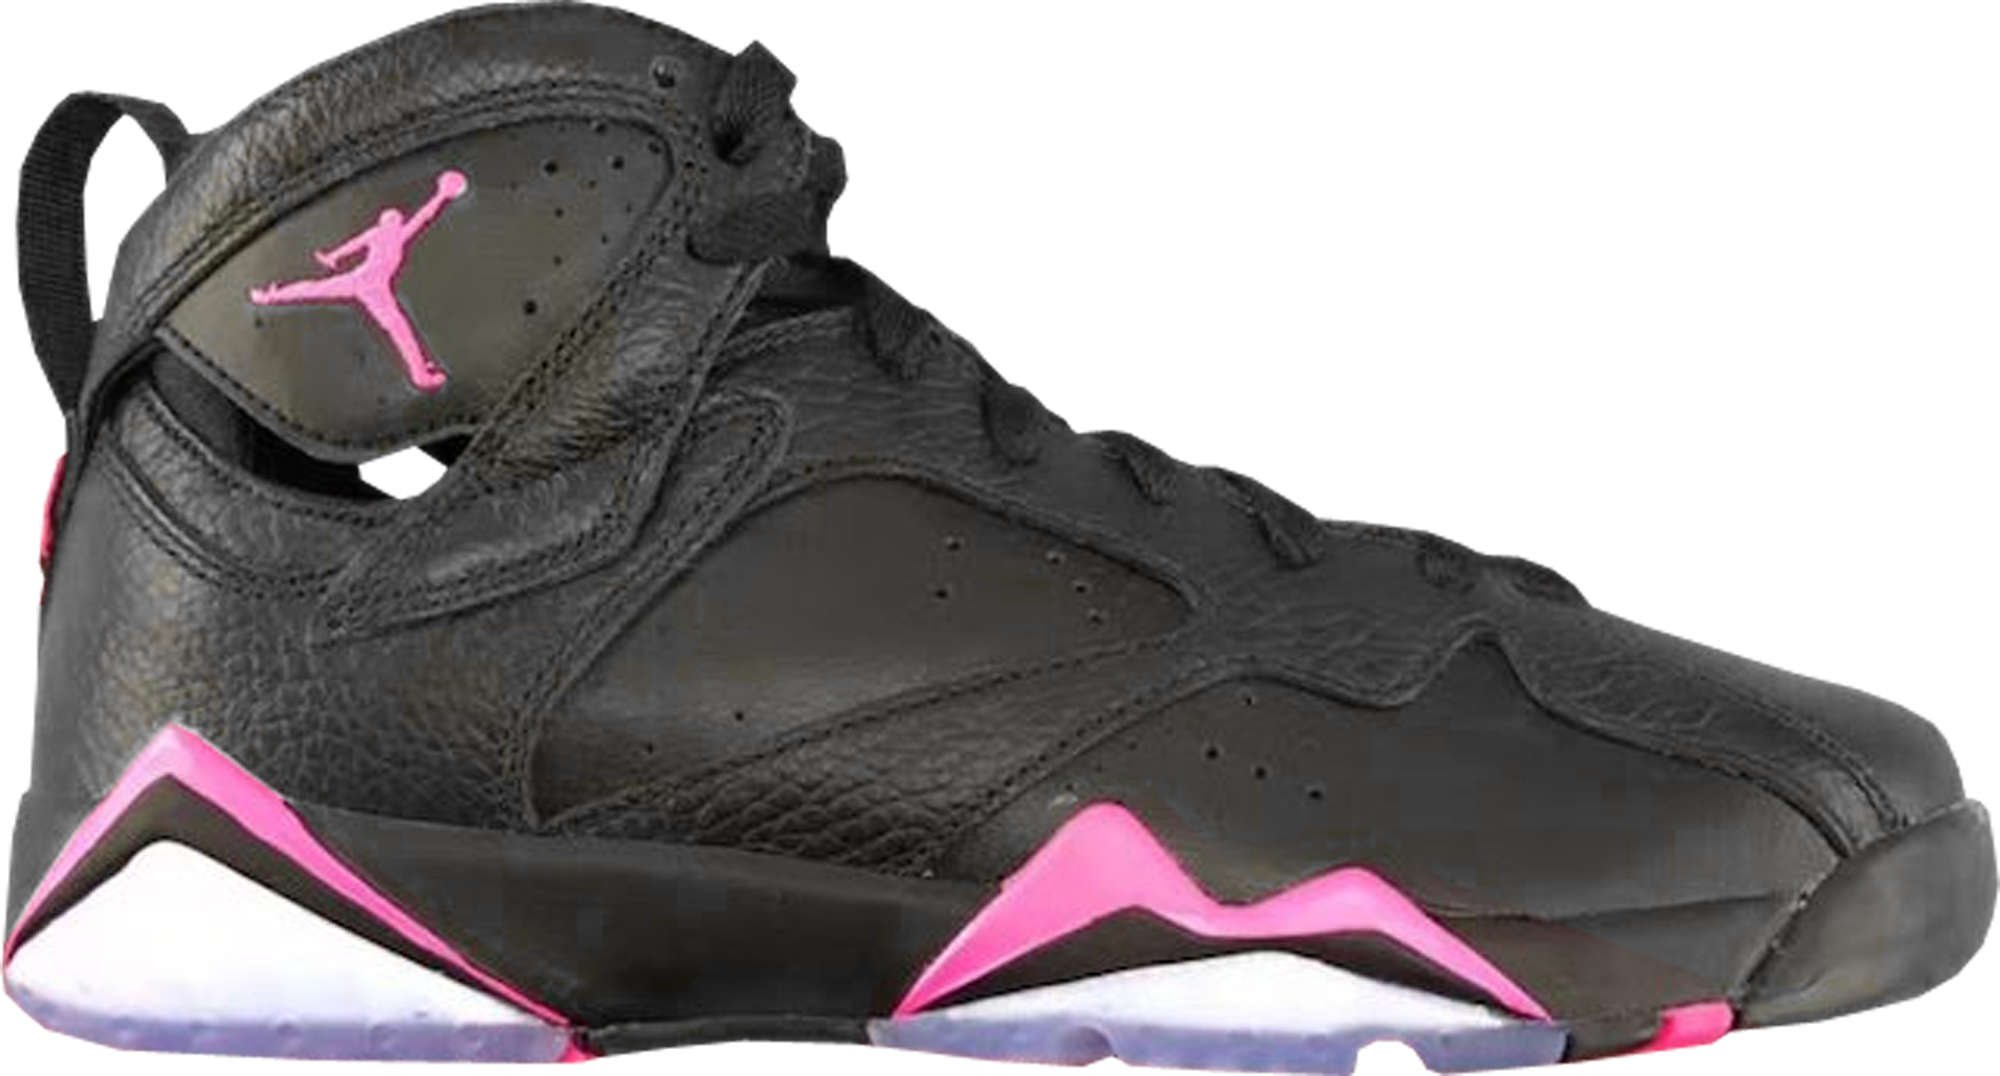 9c3bcbe0f860f1 ... canada jordan 7 retro black hyper pink gs 693d1 6fa94